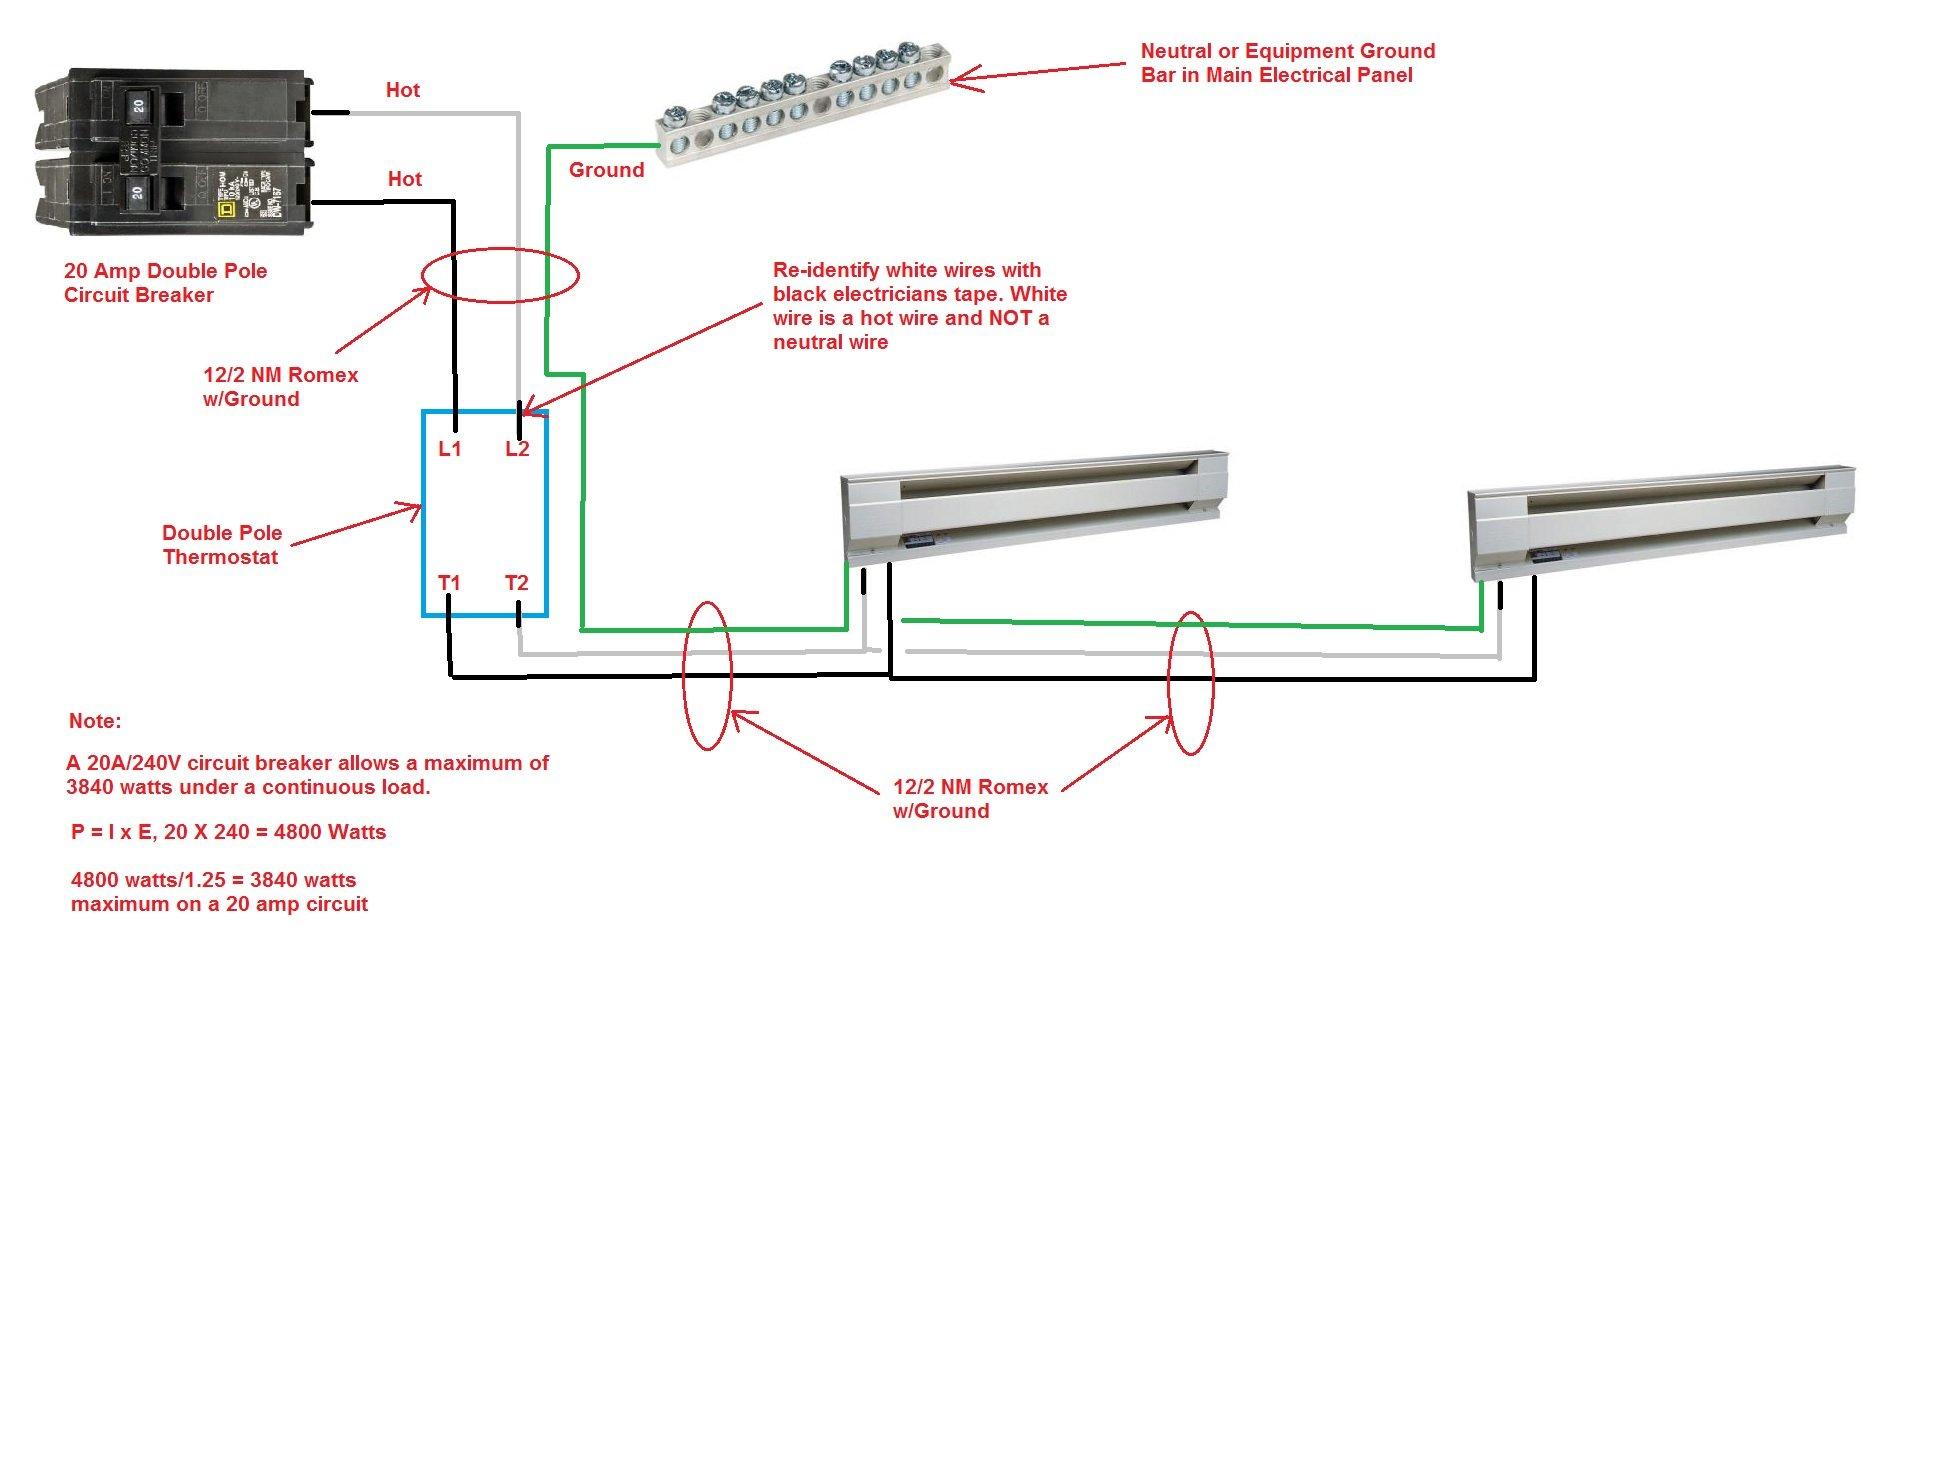 pr6 state water heater installation instructions pdf